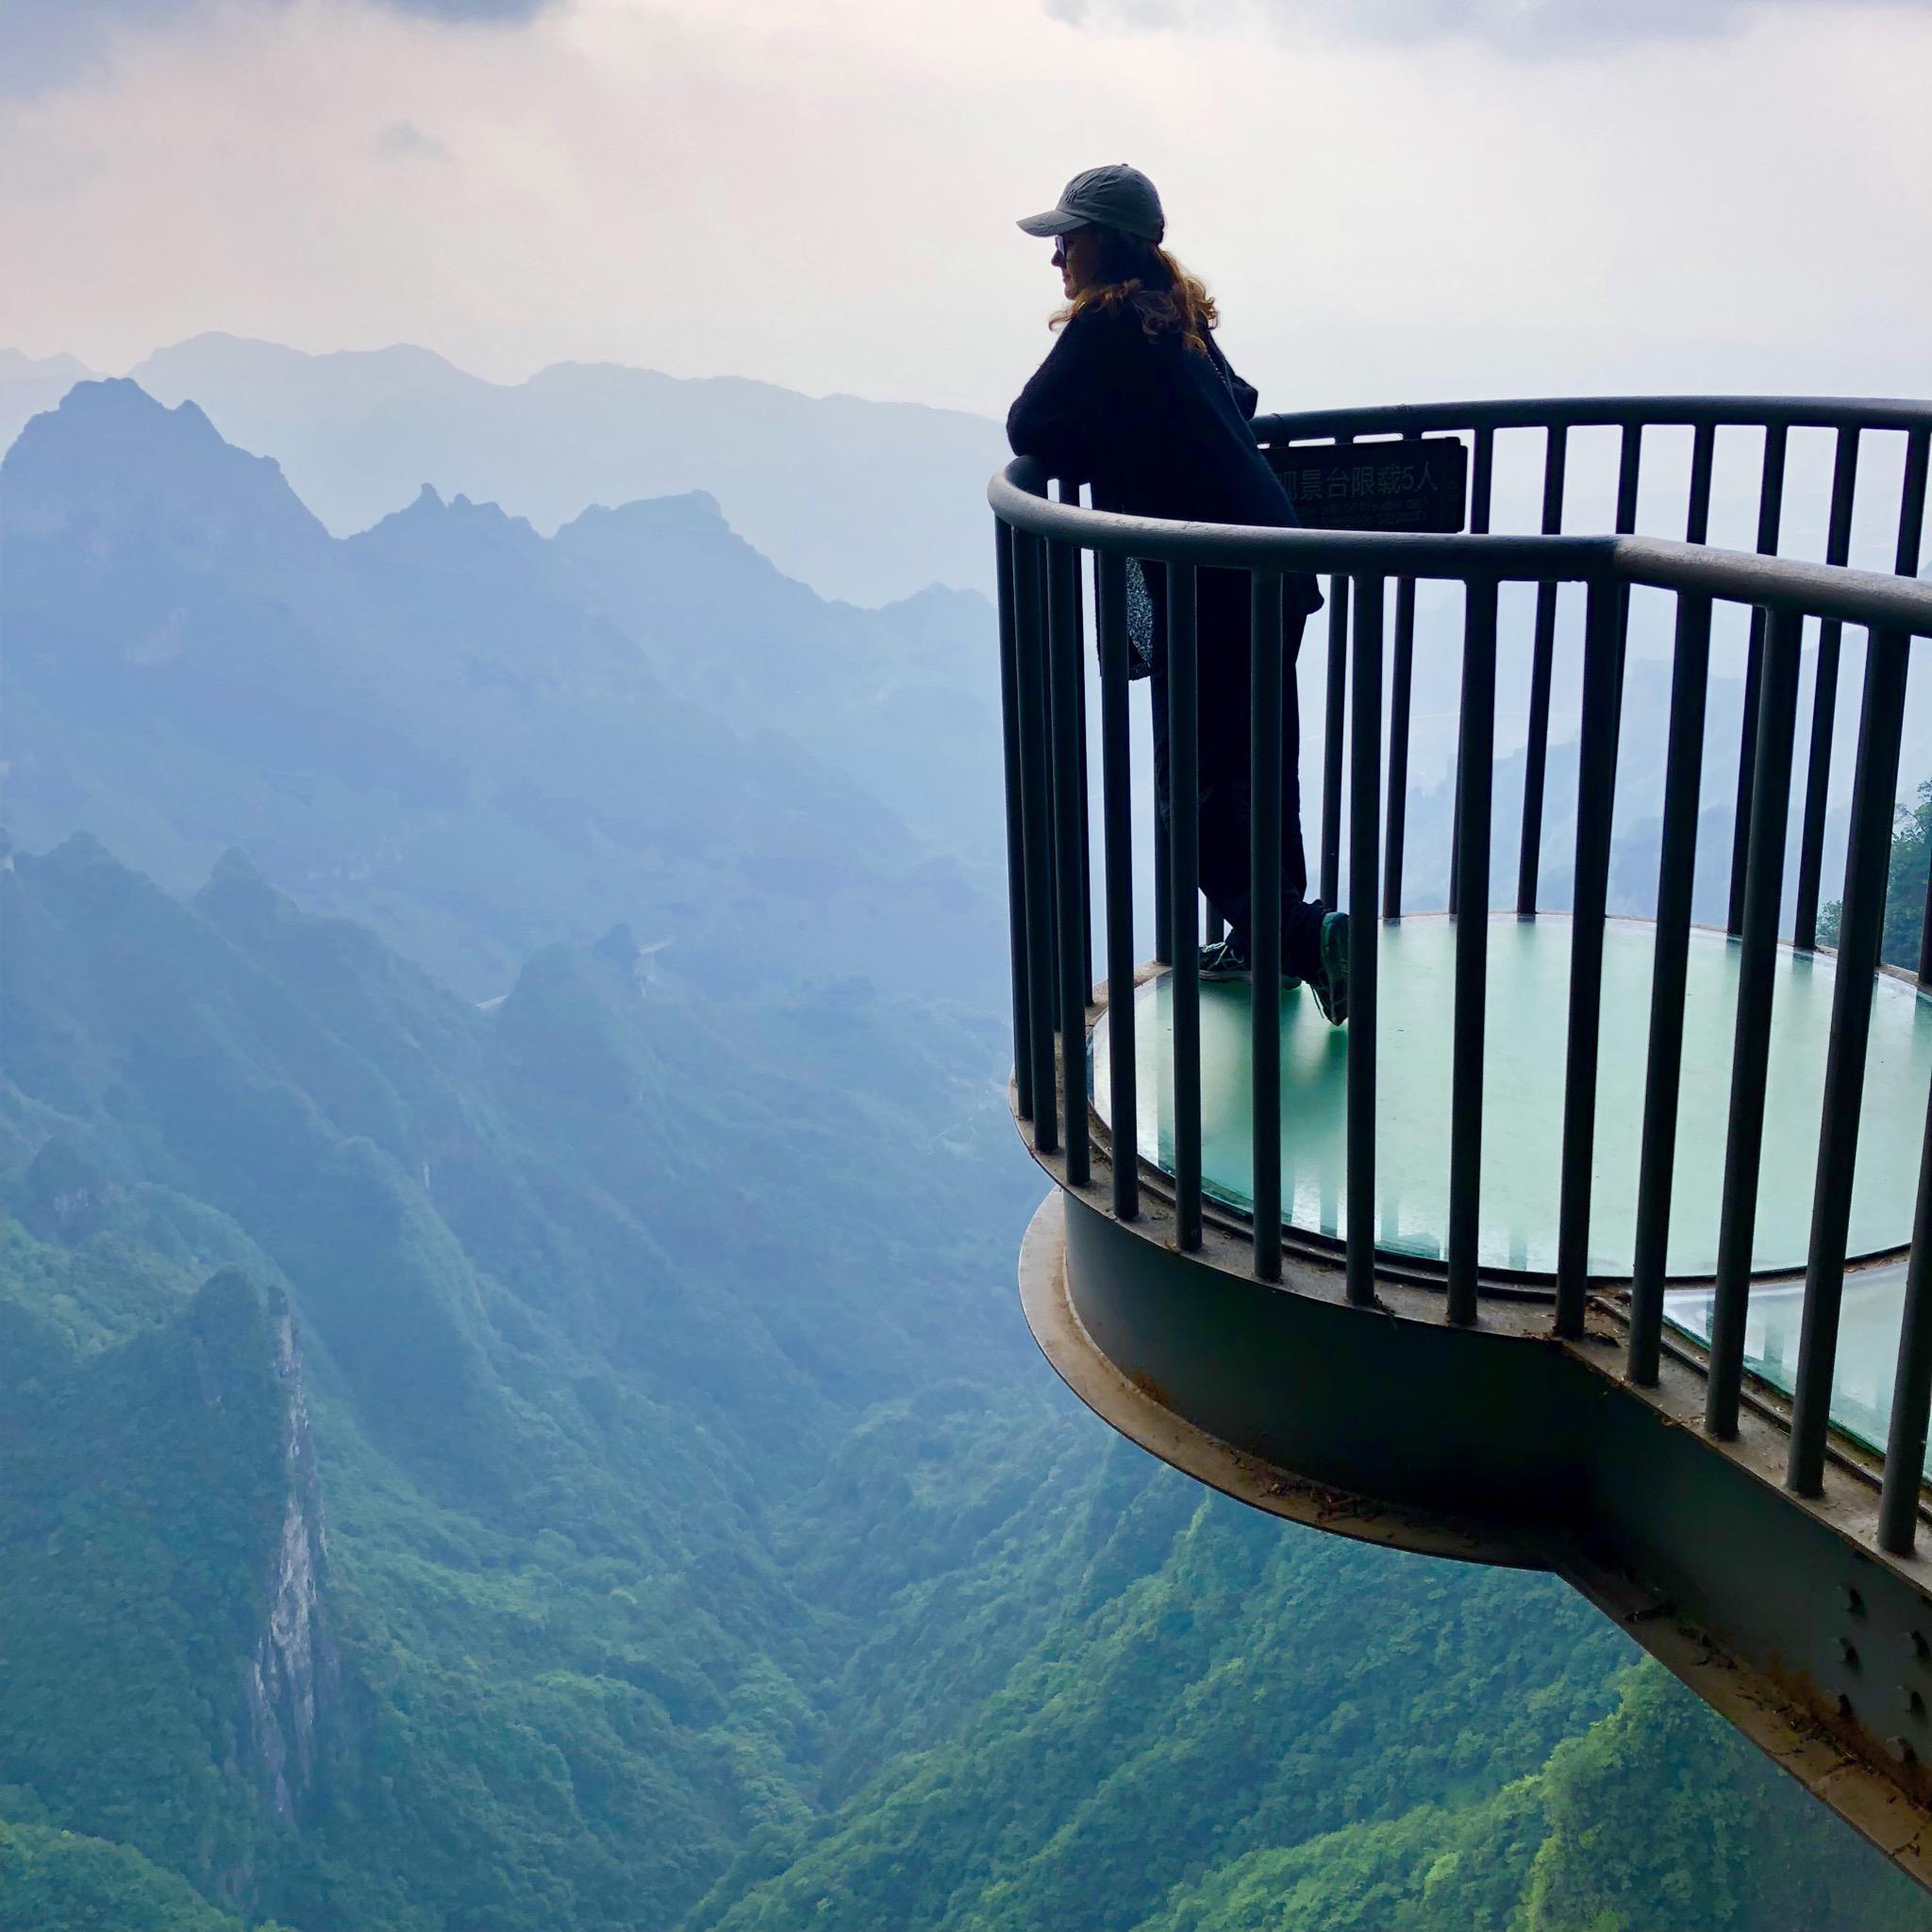 Die grüne Lunge Chinas